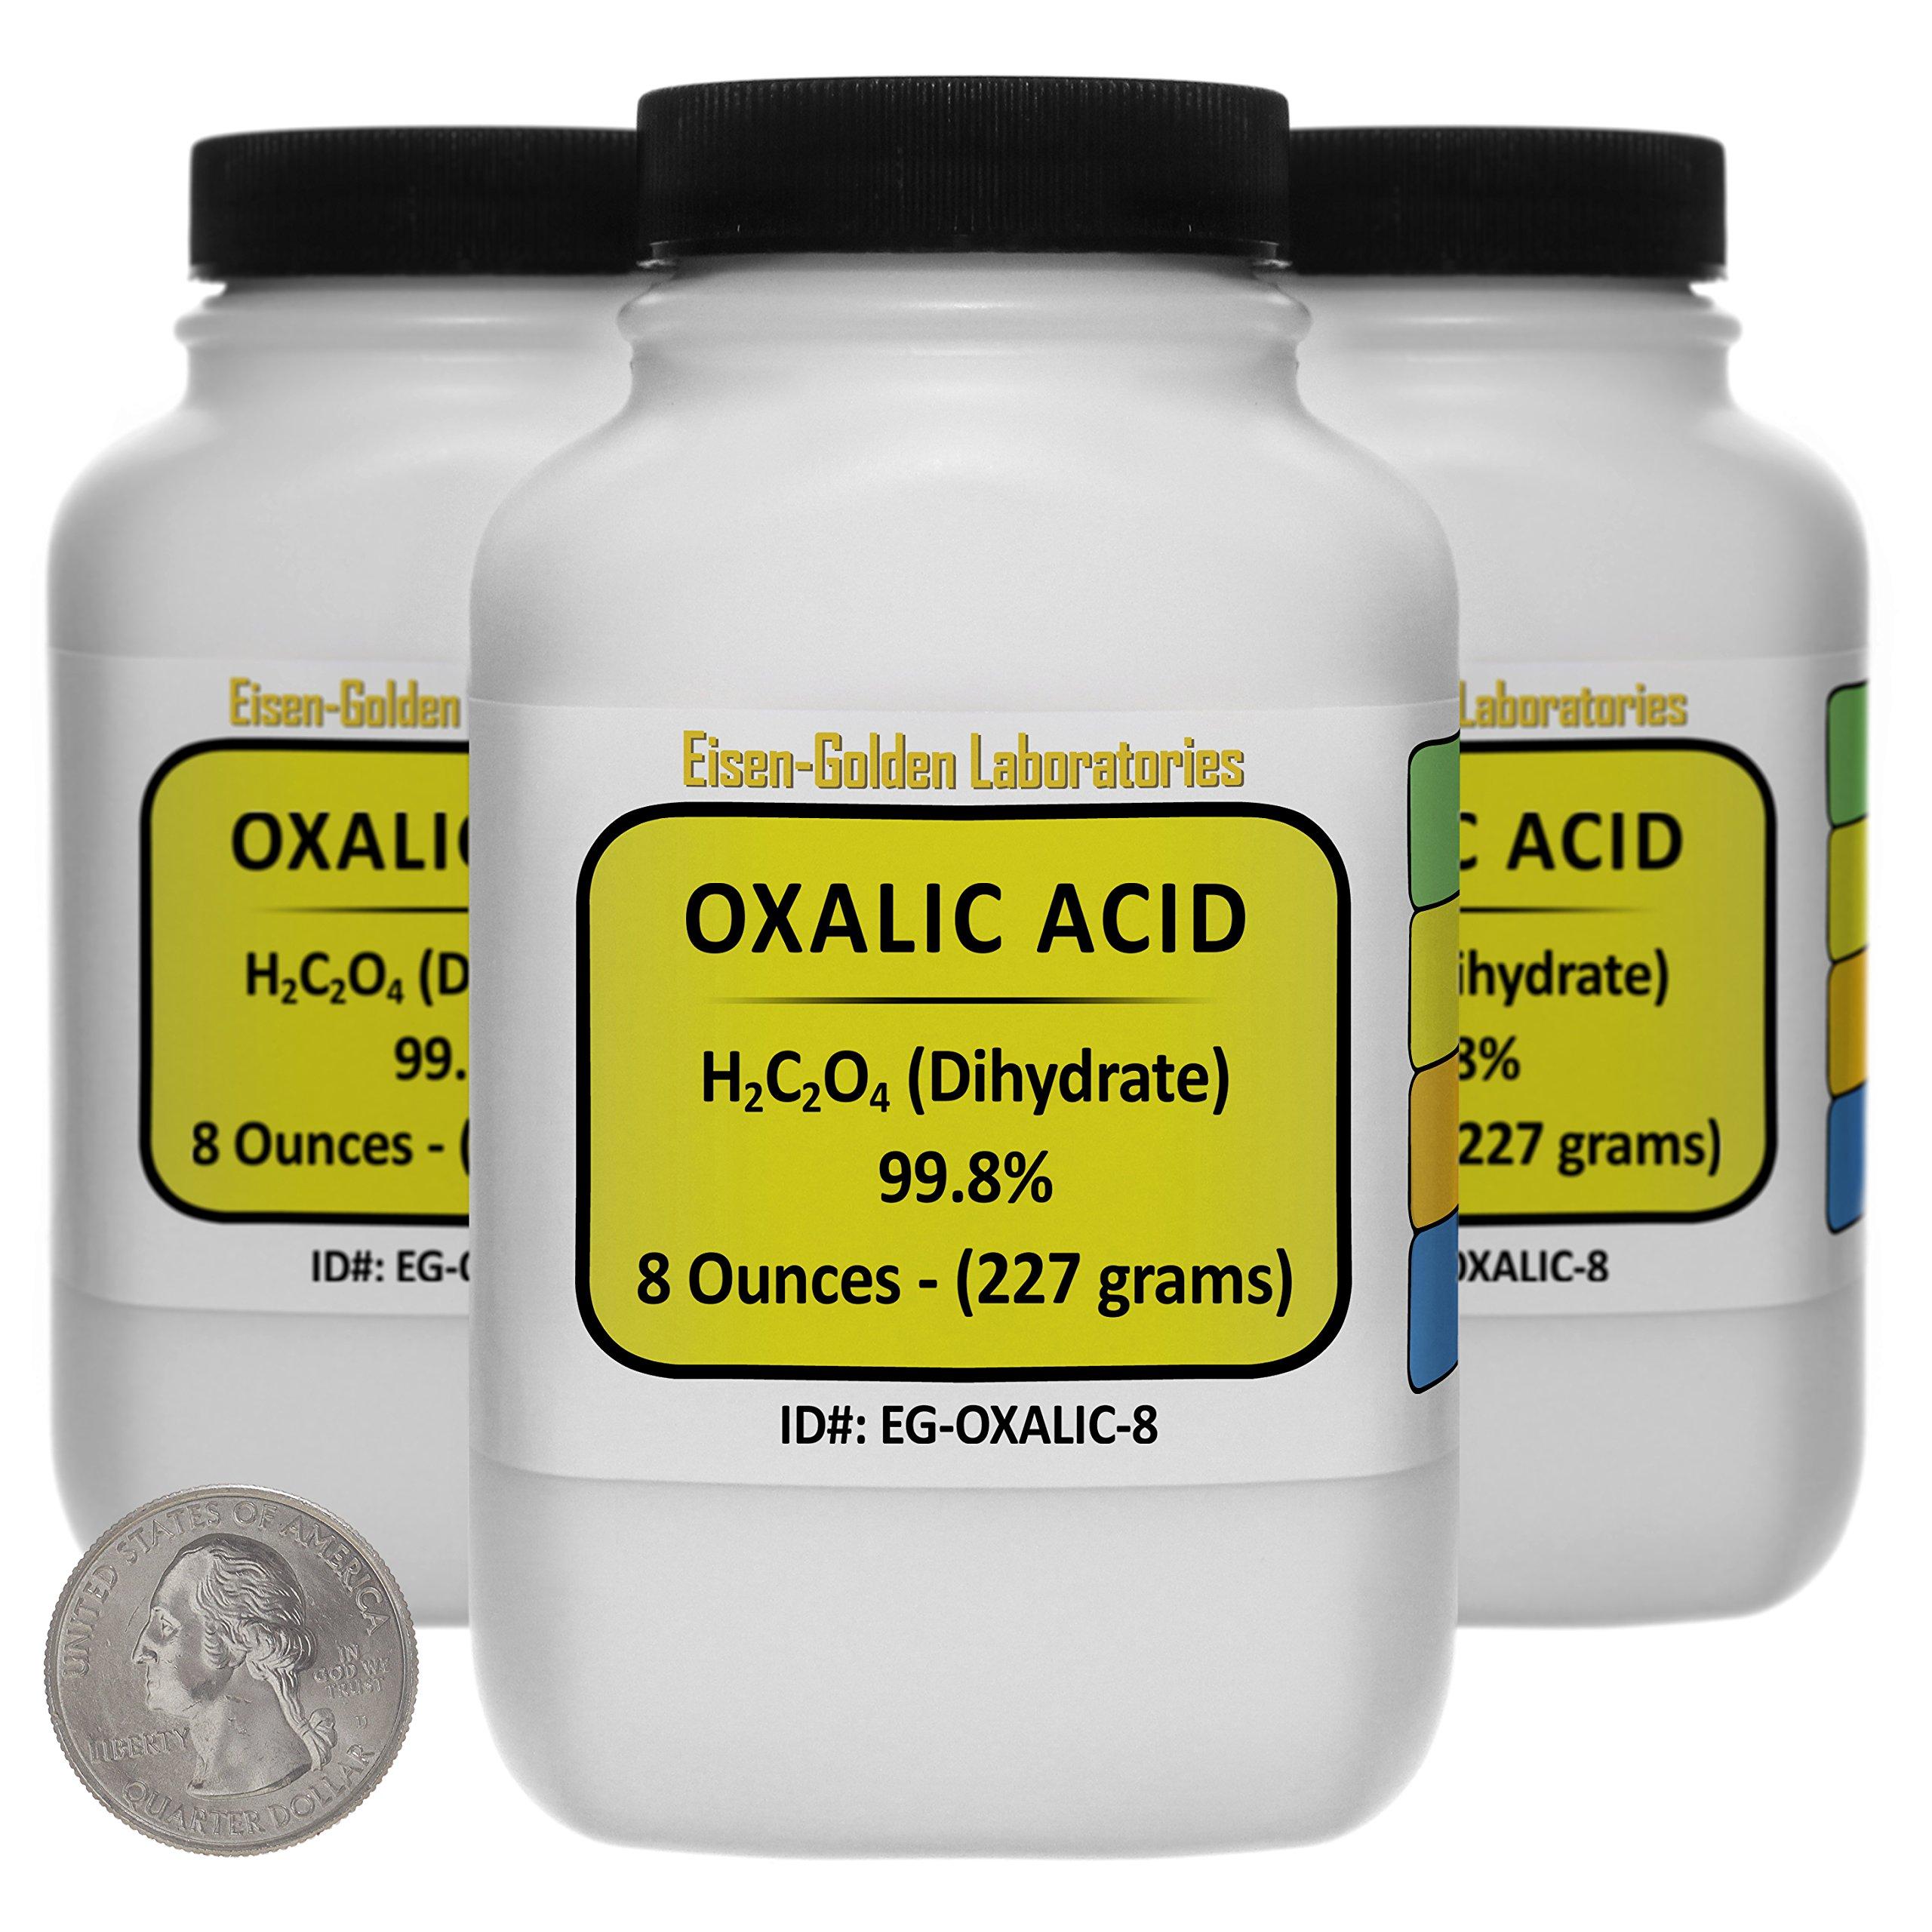 Oxalic Acid [C2H2O4] 99.8% ACS Grade Powder 1.5 Lb in Three Space-Saver Bottles USA